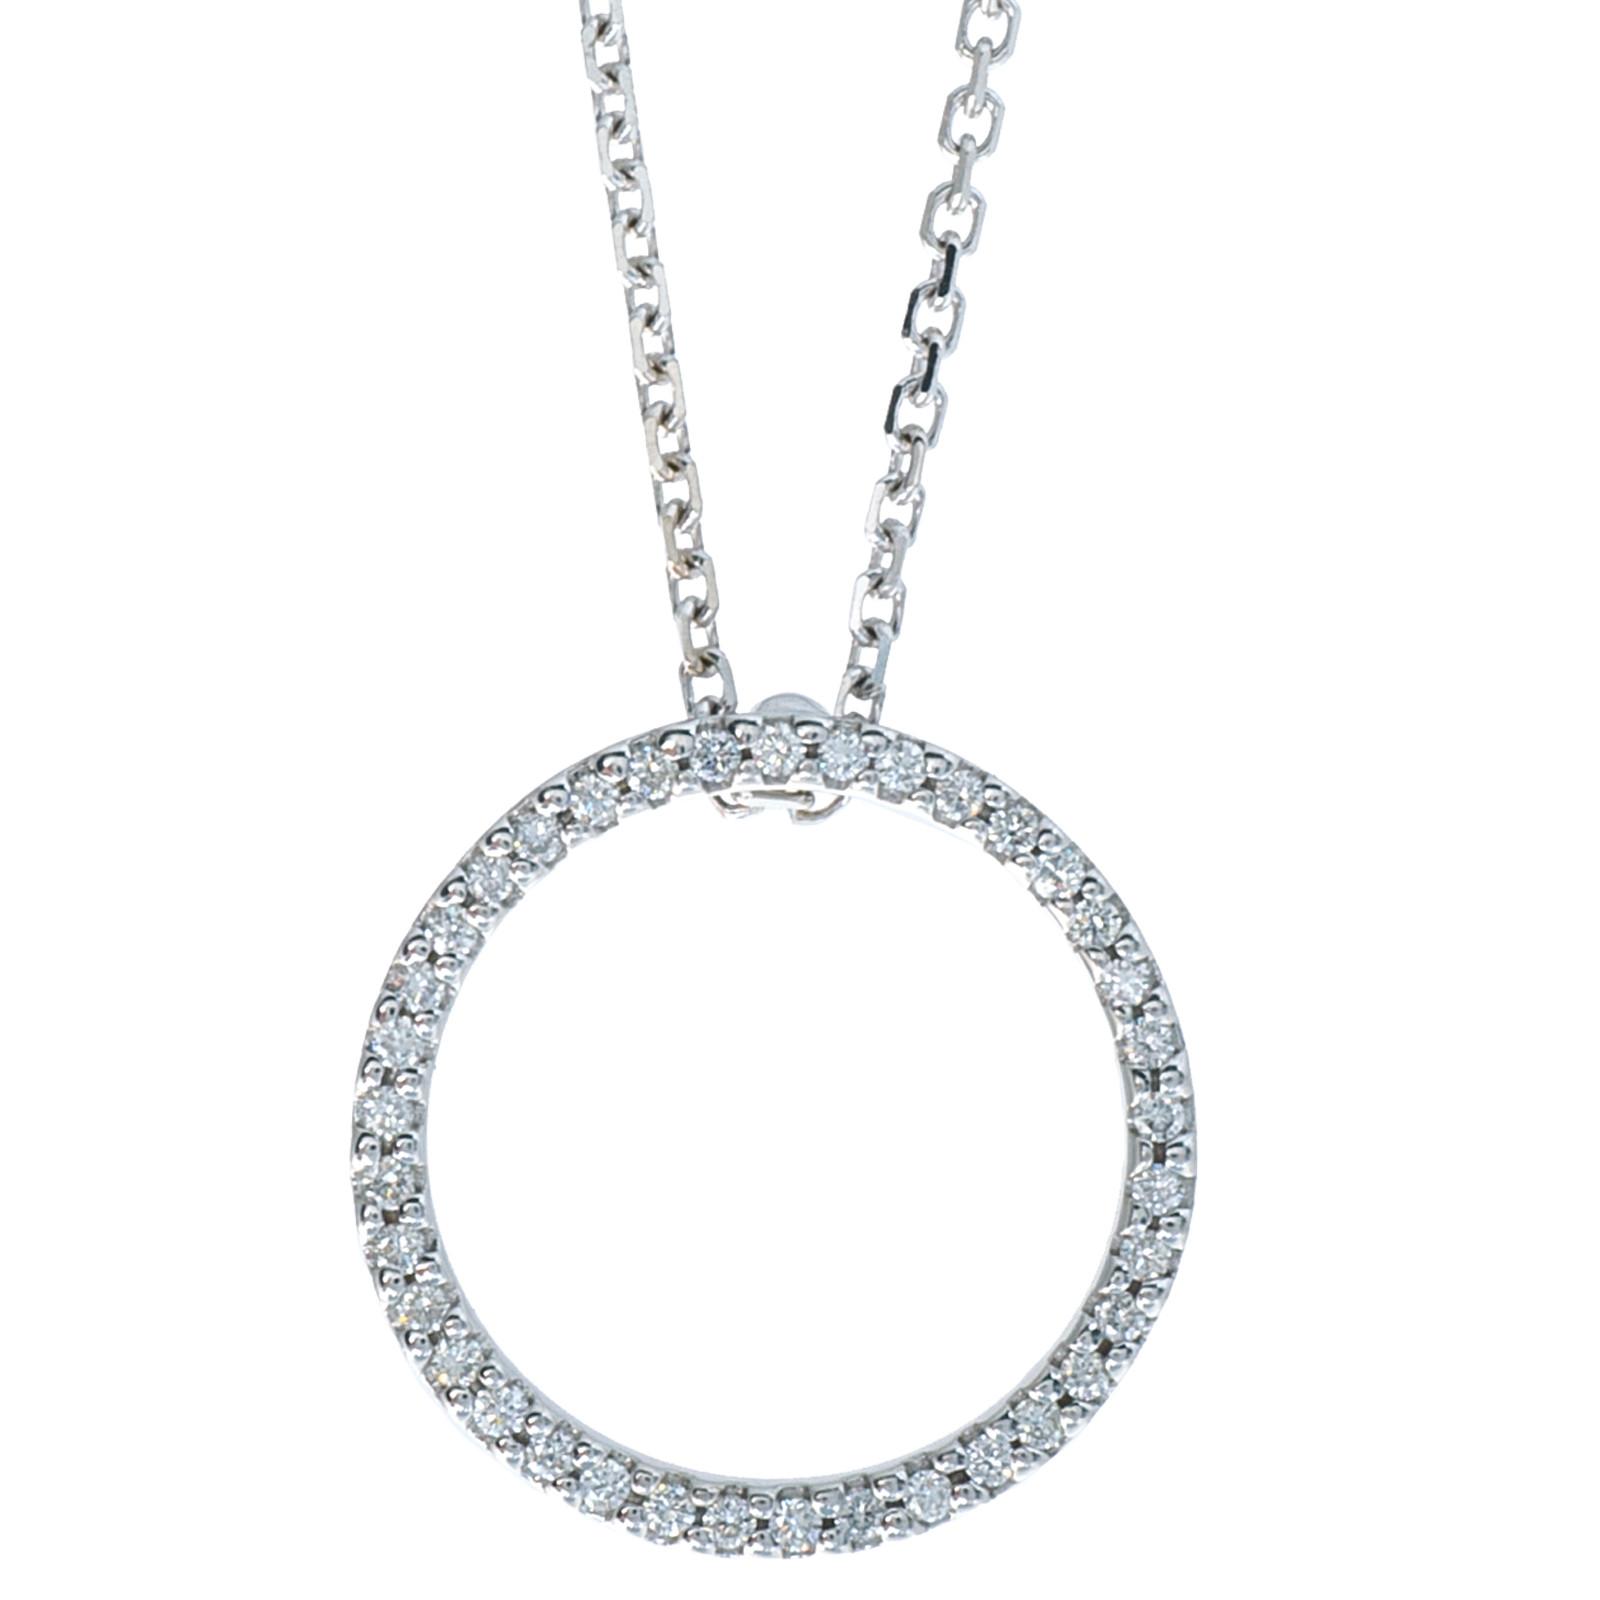 VIntage Roberto Coin Circle of Life Necklace